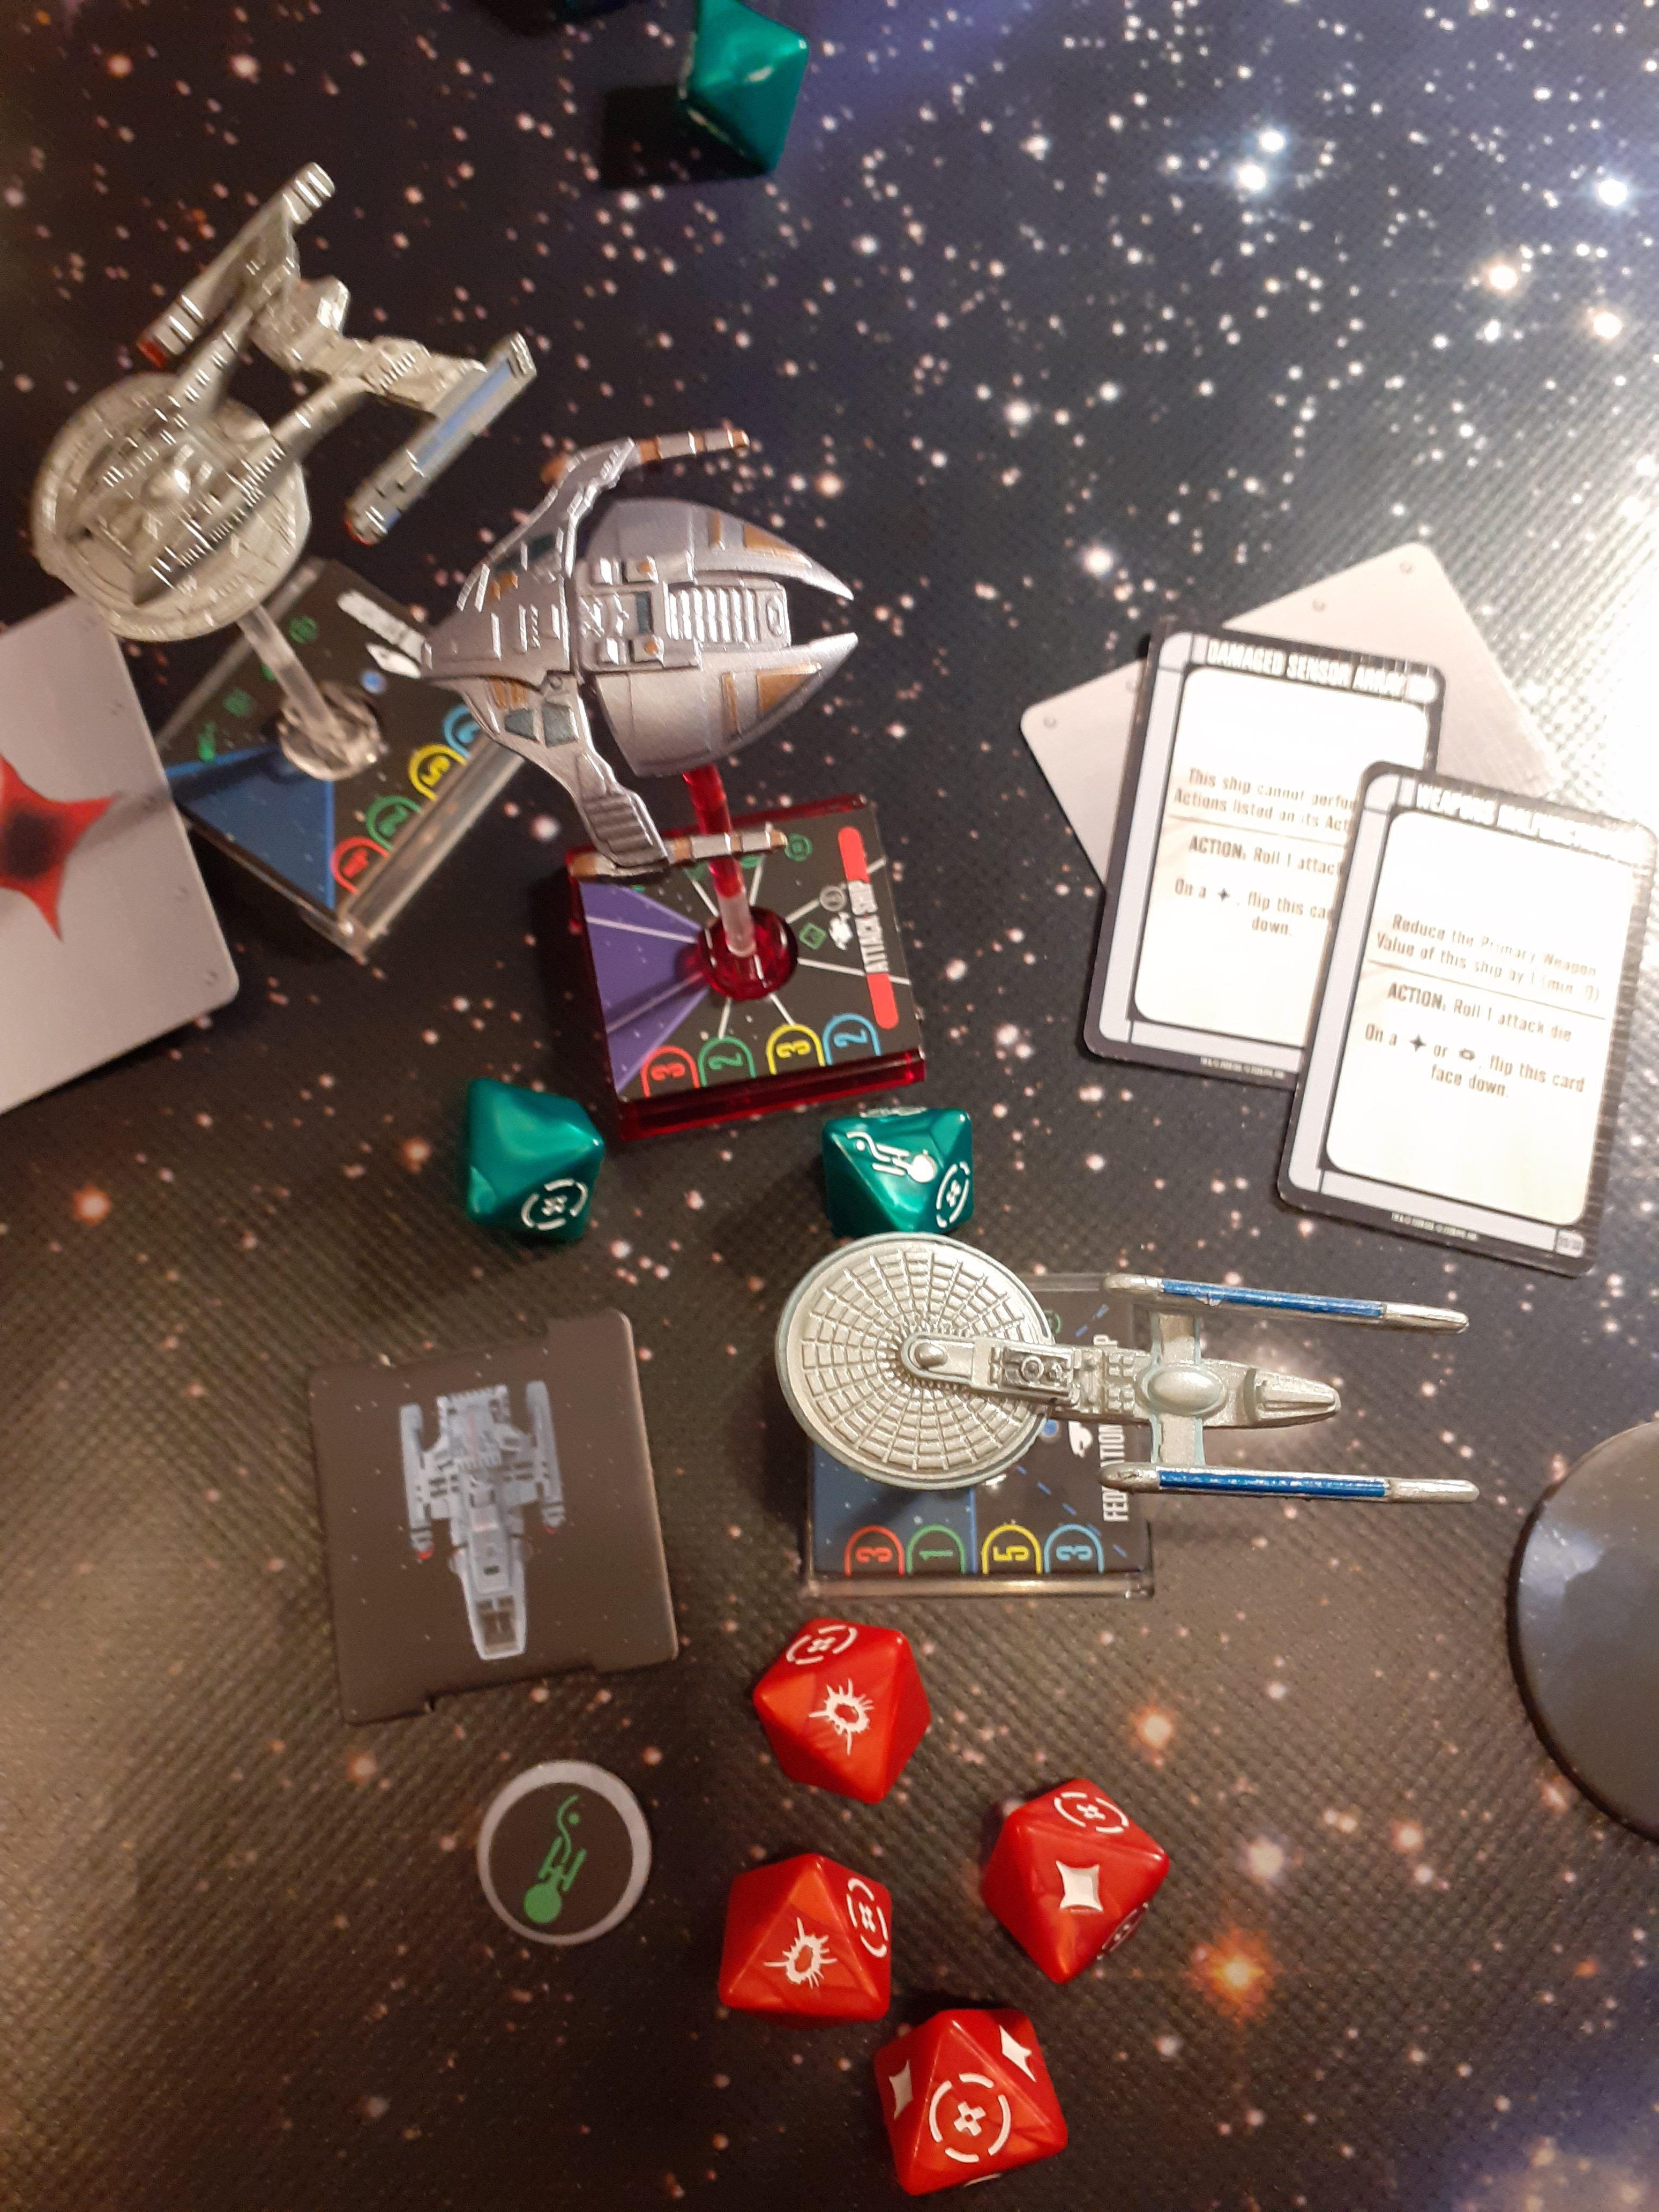 [Star Trek Alliance - Dominion War Campaign I] Computerlogbuch der Solo-Kampagne von Commander Cut  20210403_021206-e1617448480438